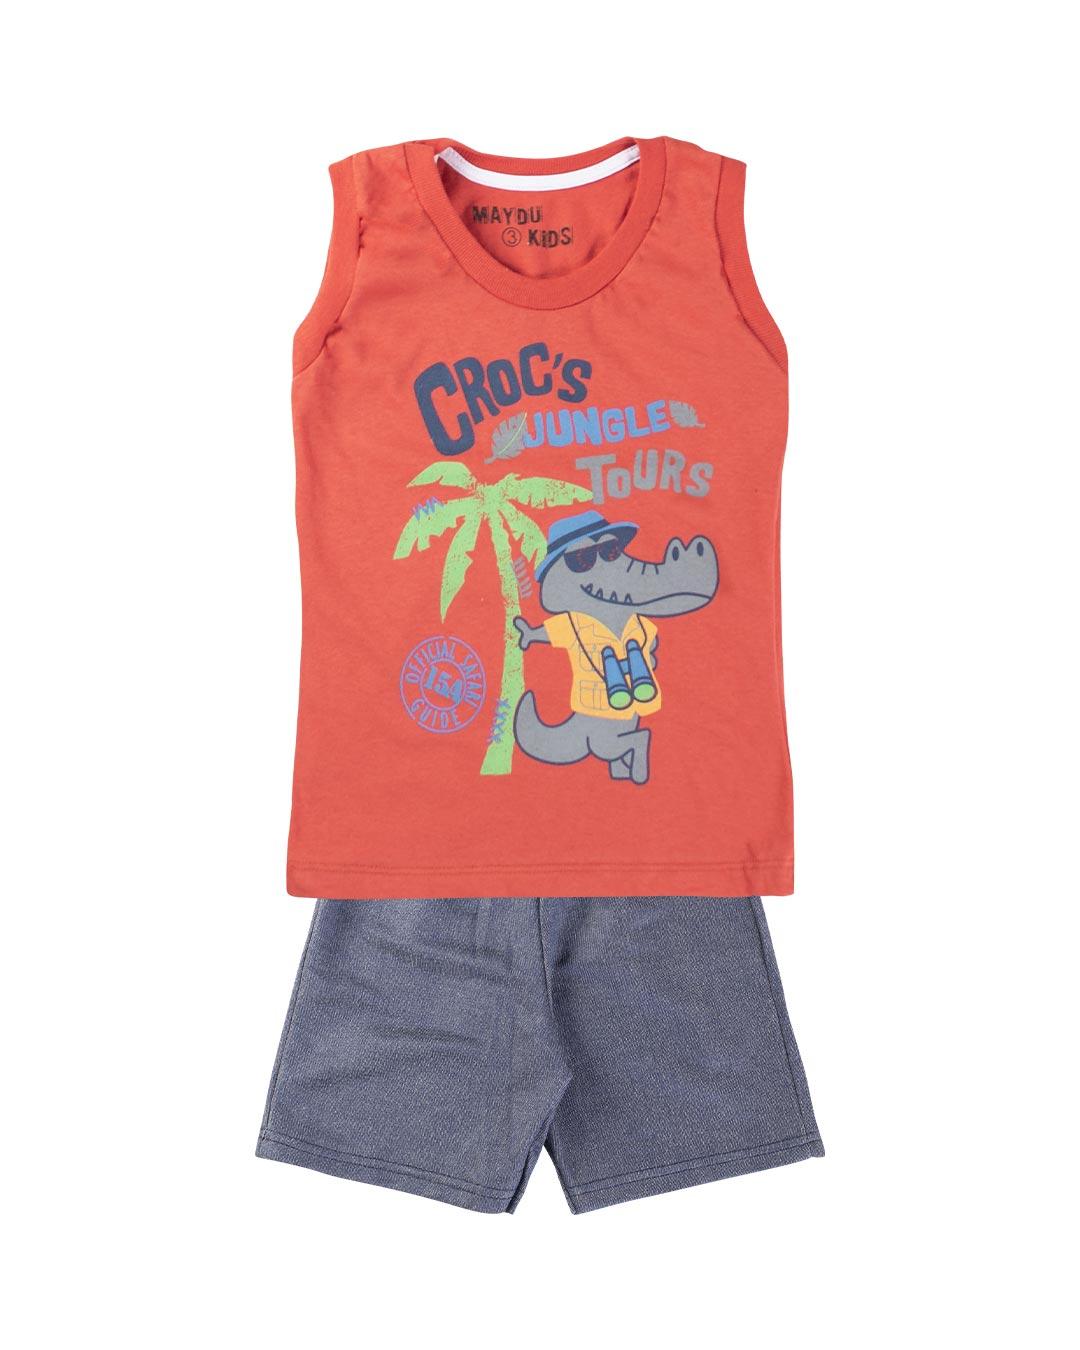 Conjunto Infantil Croc's Jungle Tours - Maydu Kids